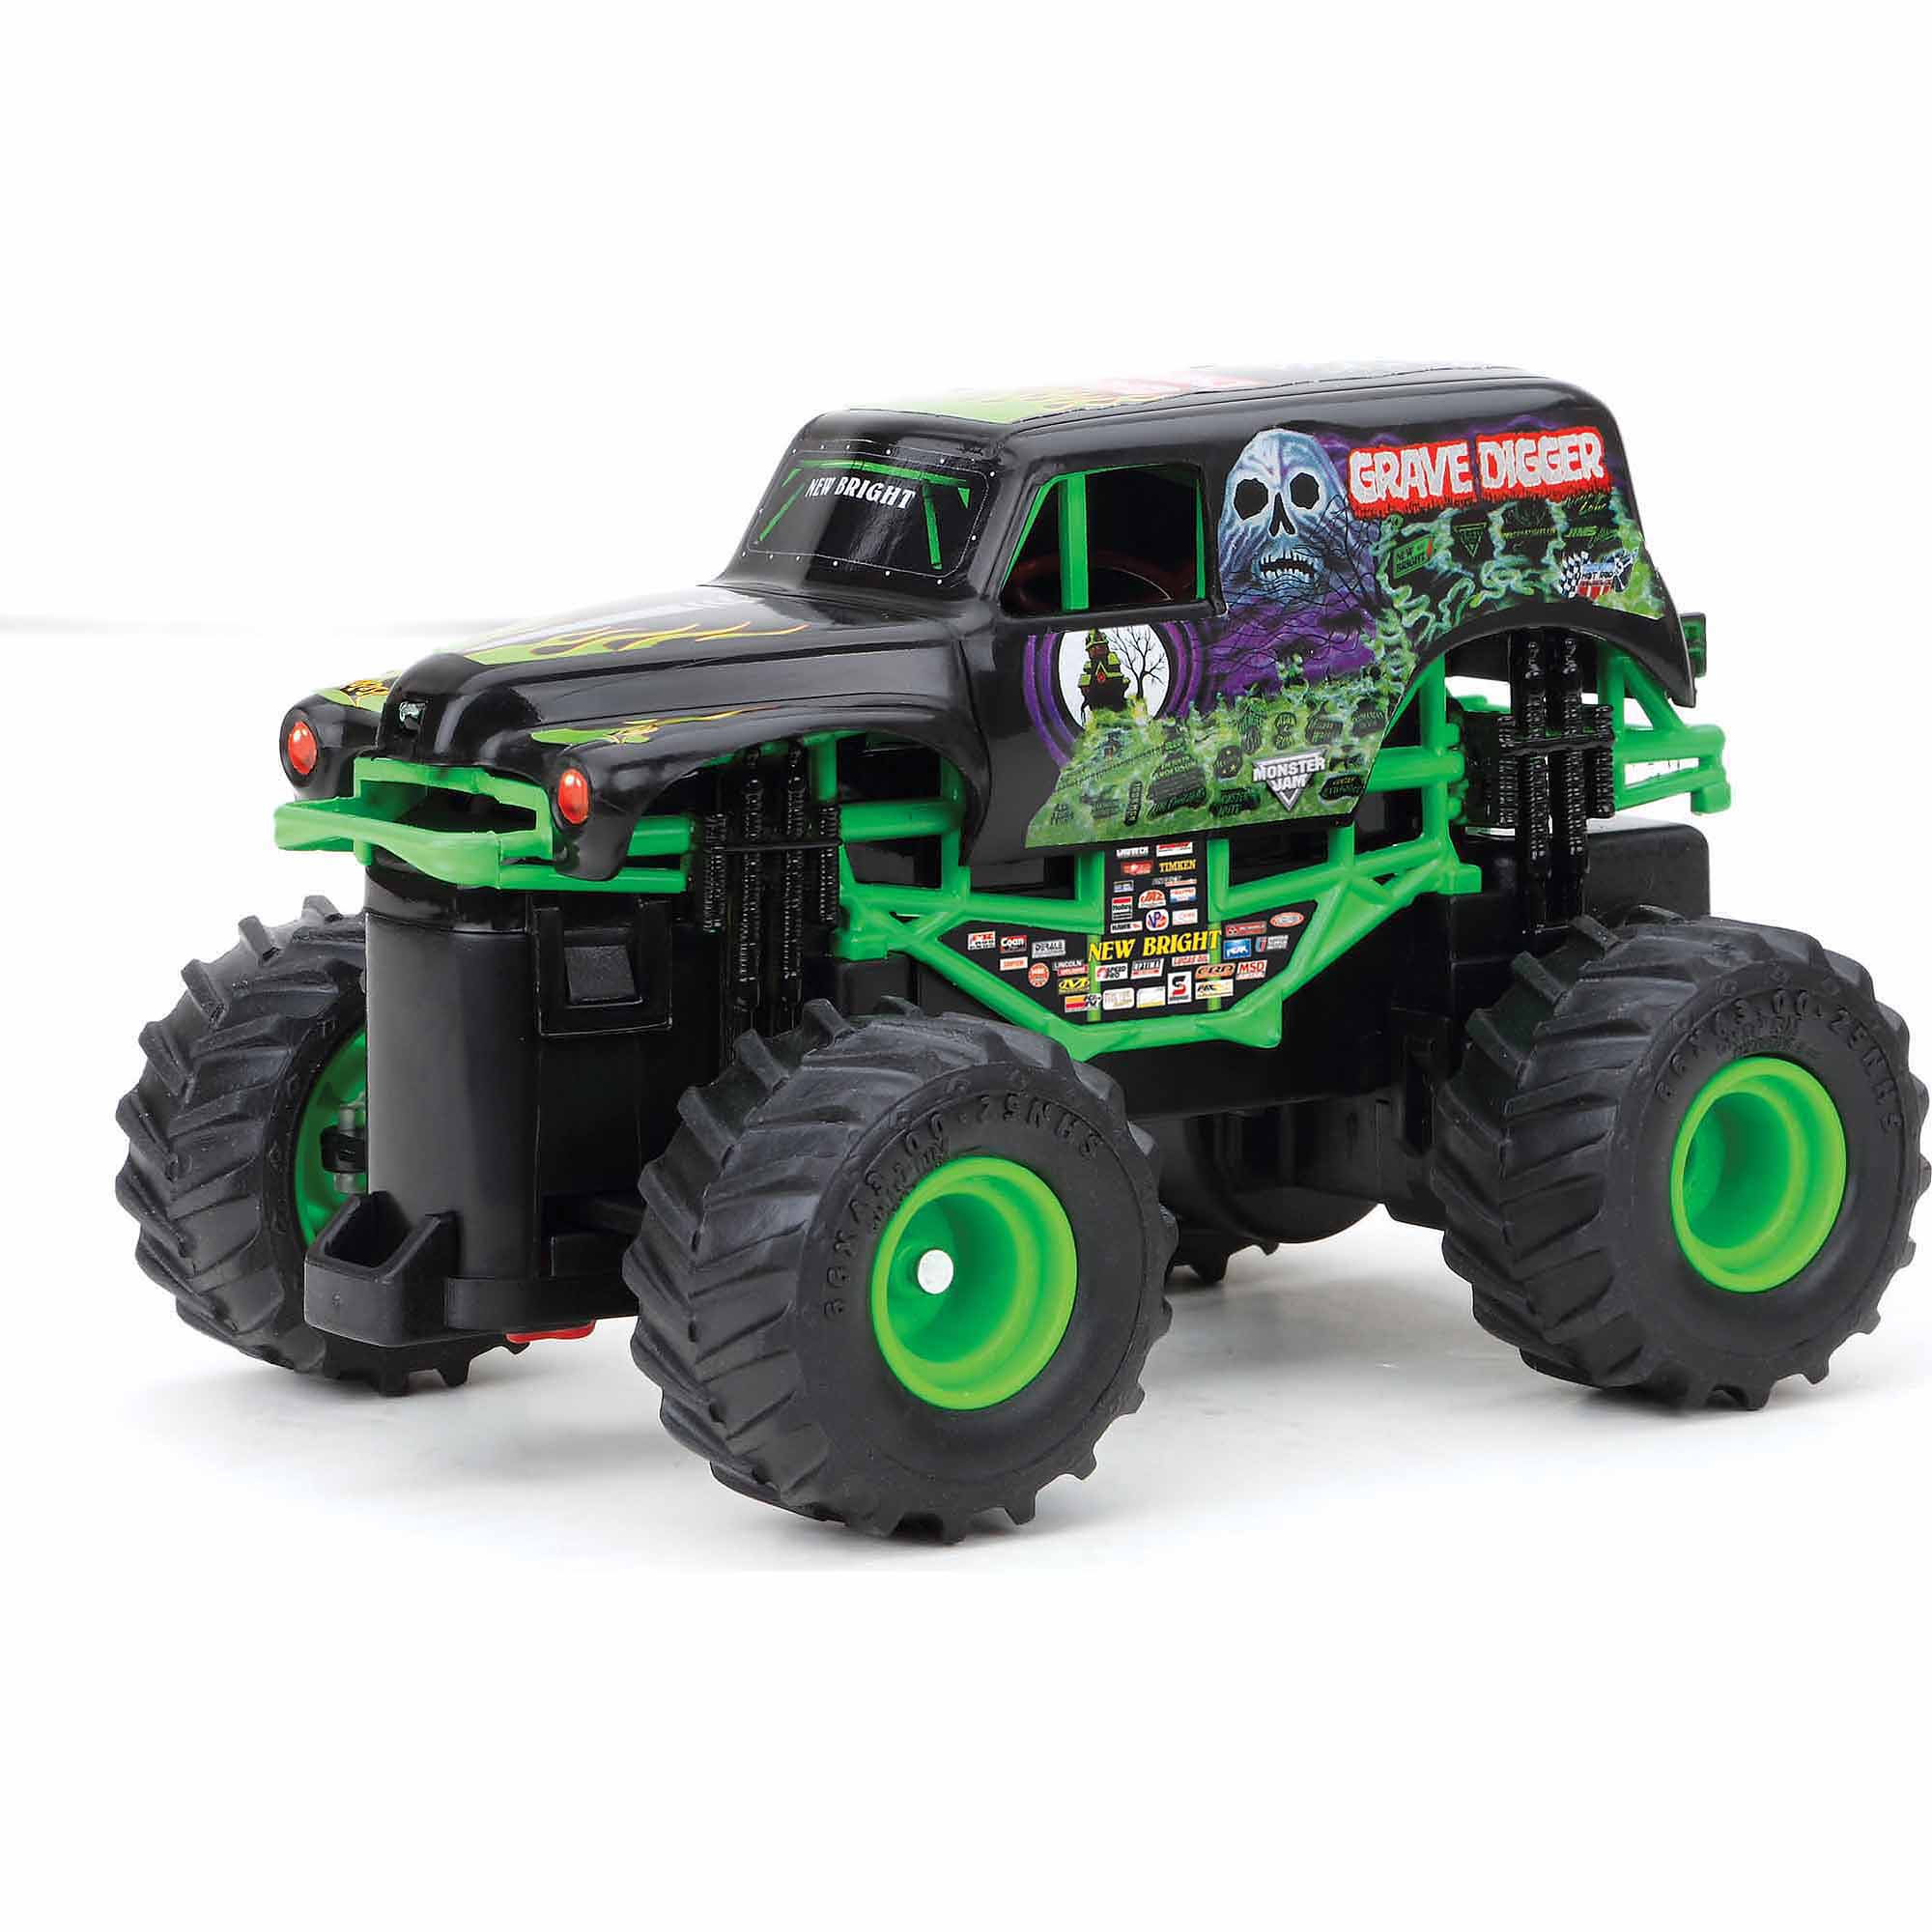 New Bright 1:43 Radio Control Full-Function Monster Jam Grave Digger, Black